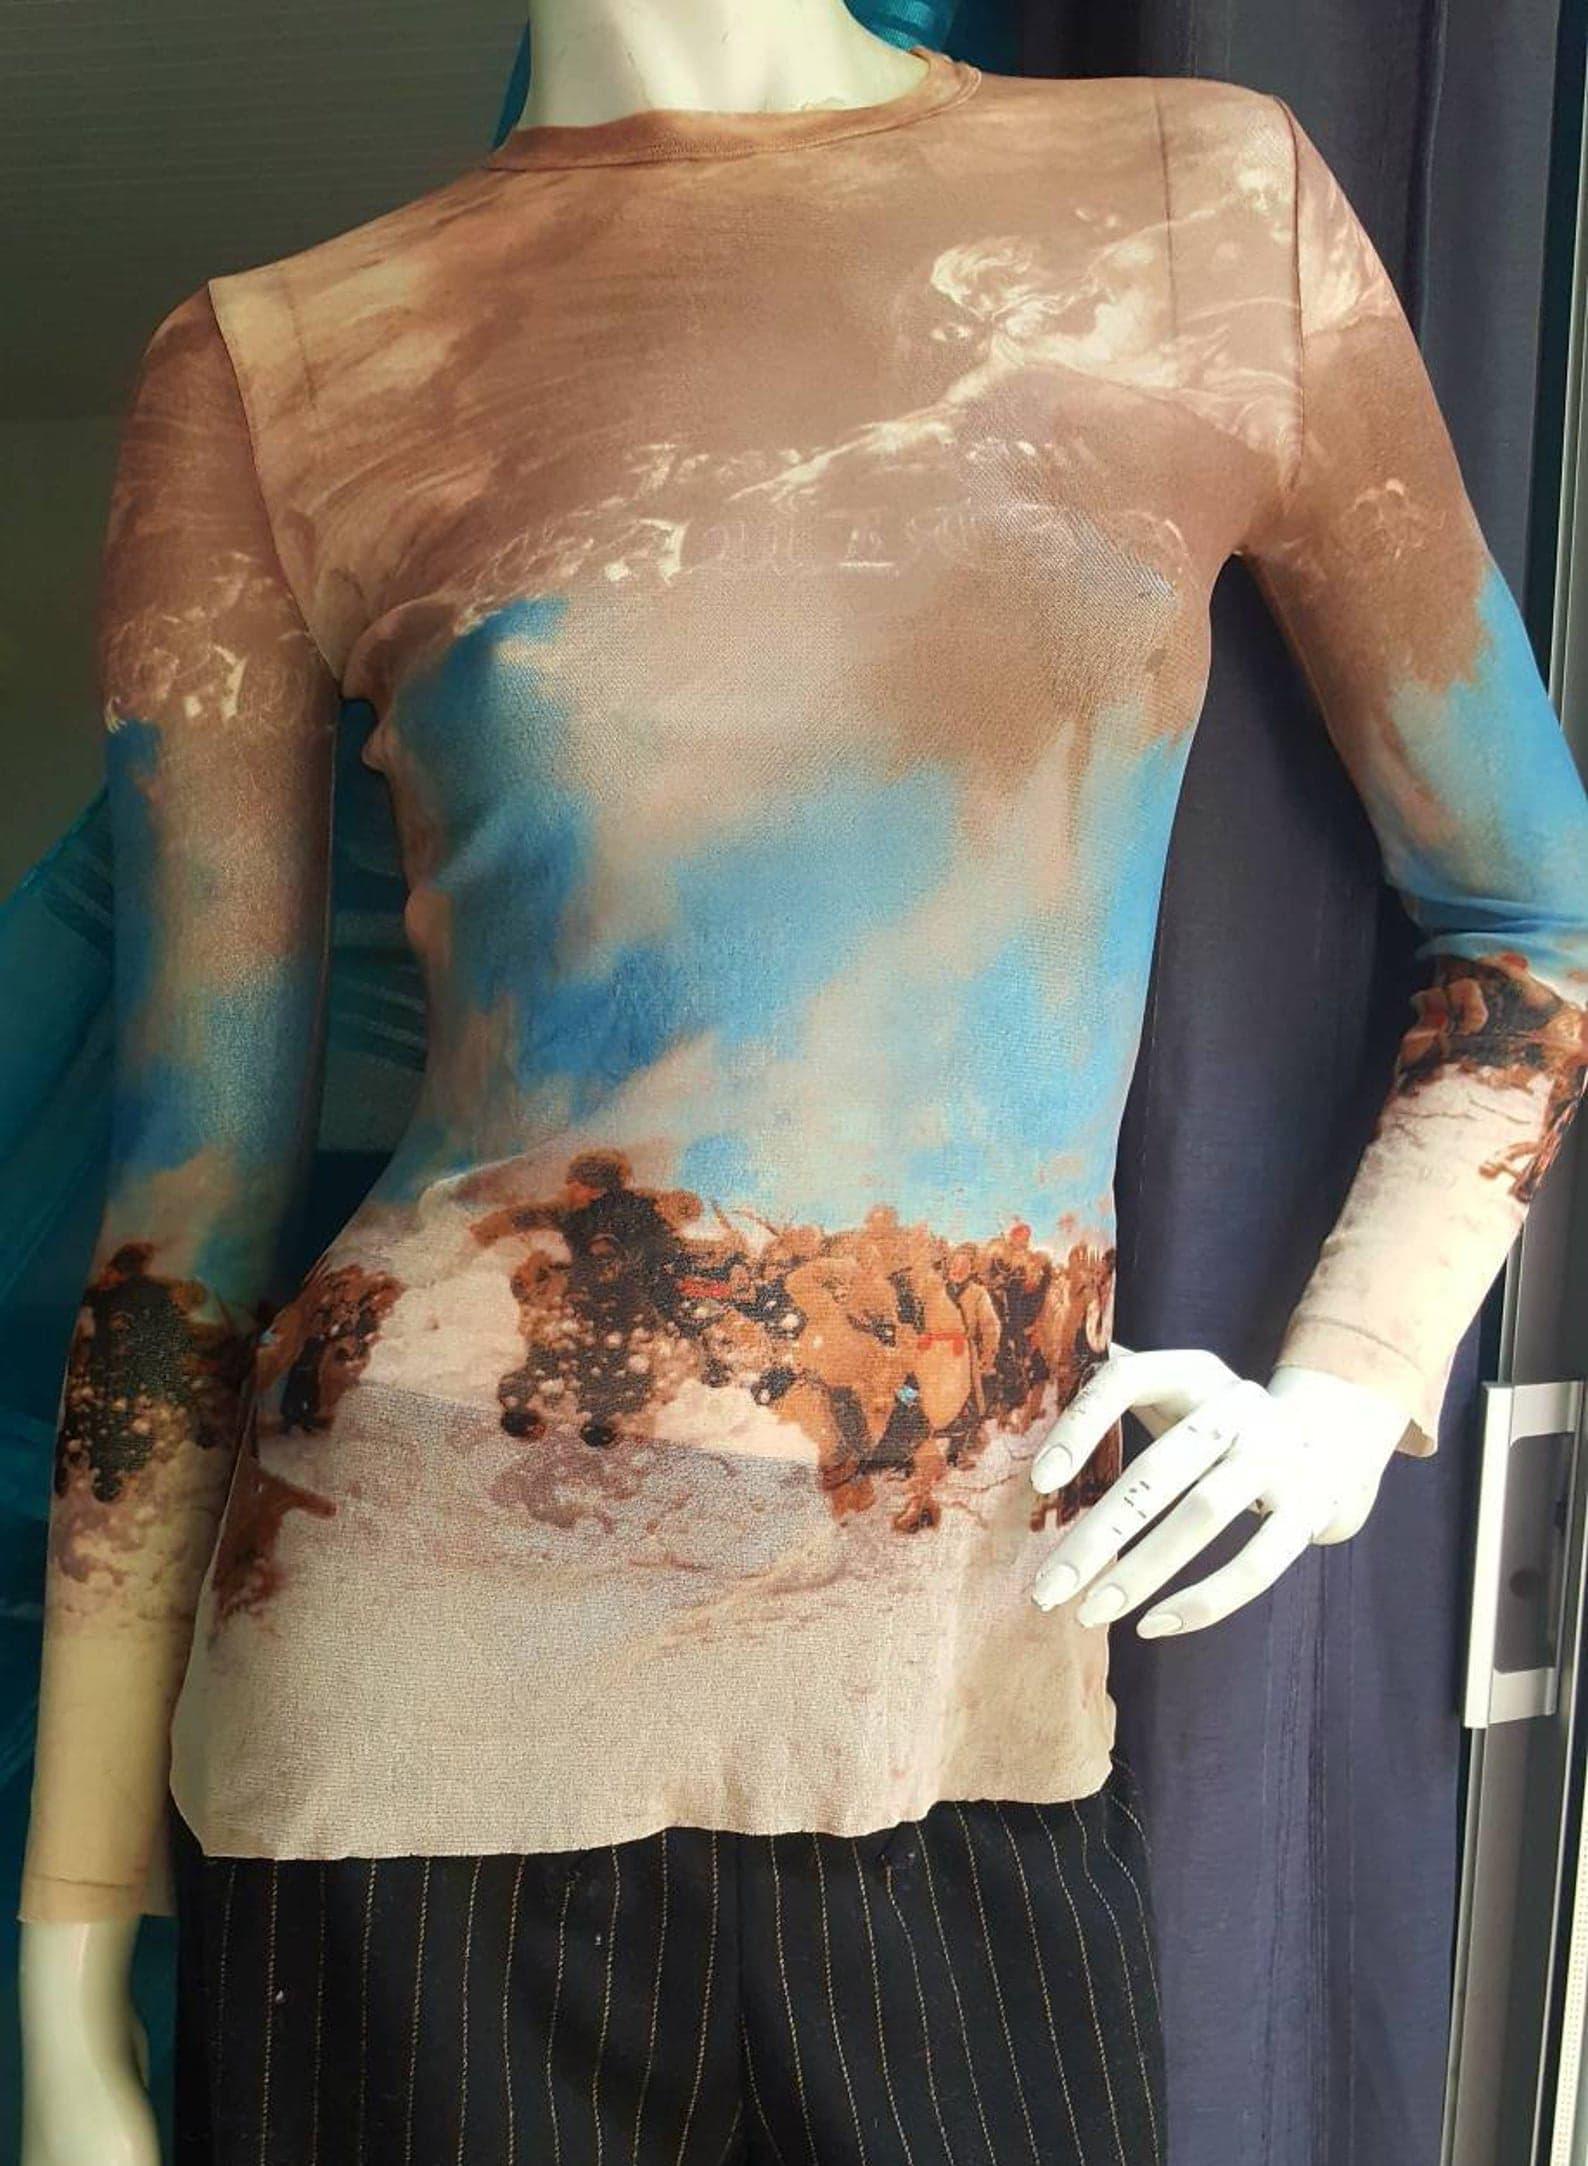 Jean Paul Gaultier jean Paul Gaultier top tattoo multicolor printed T-shirt S 36